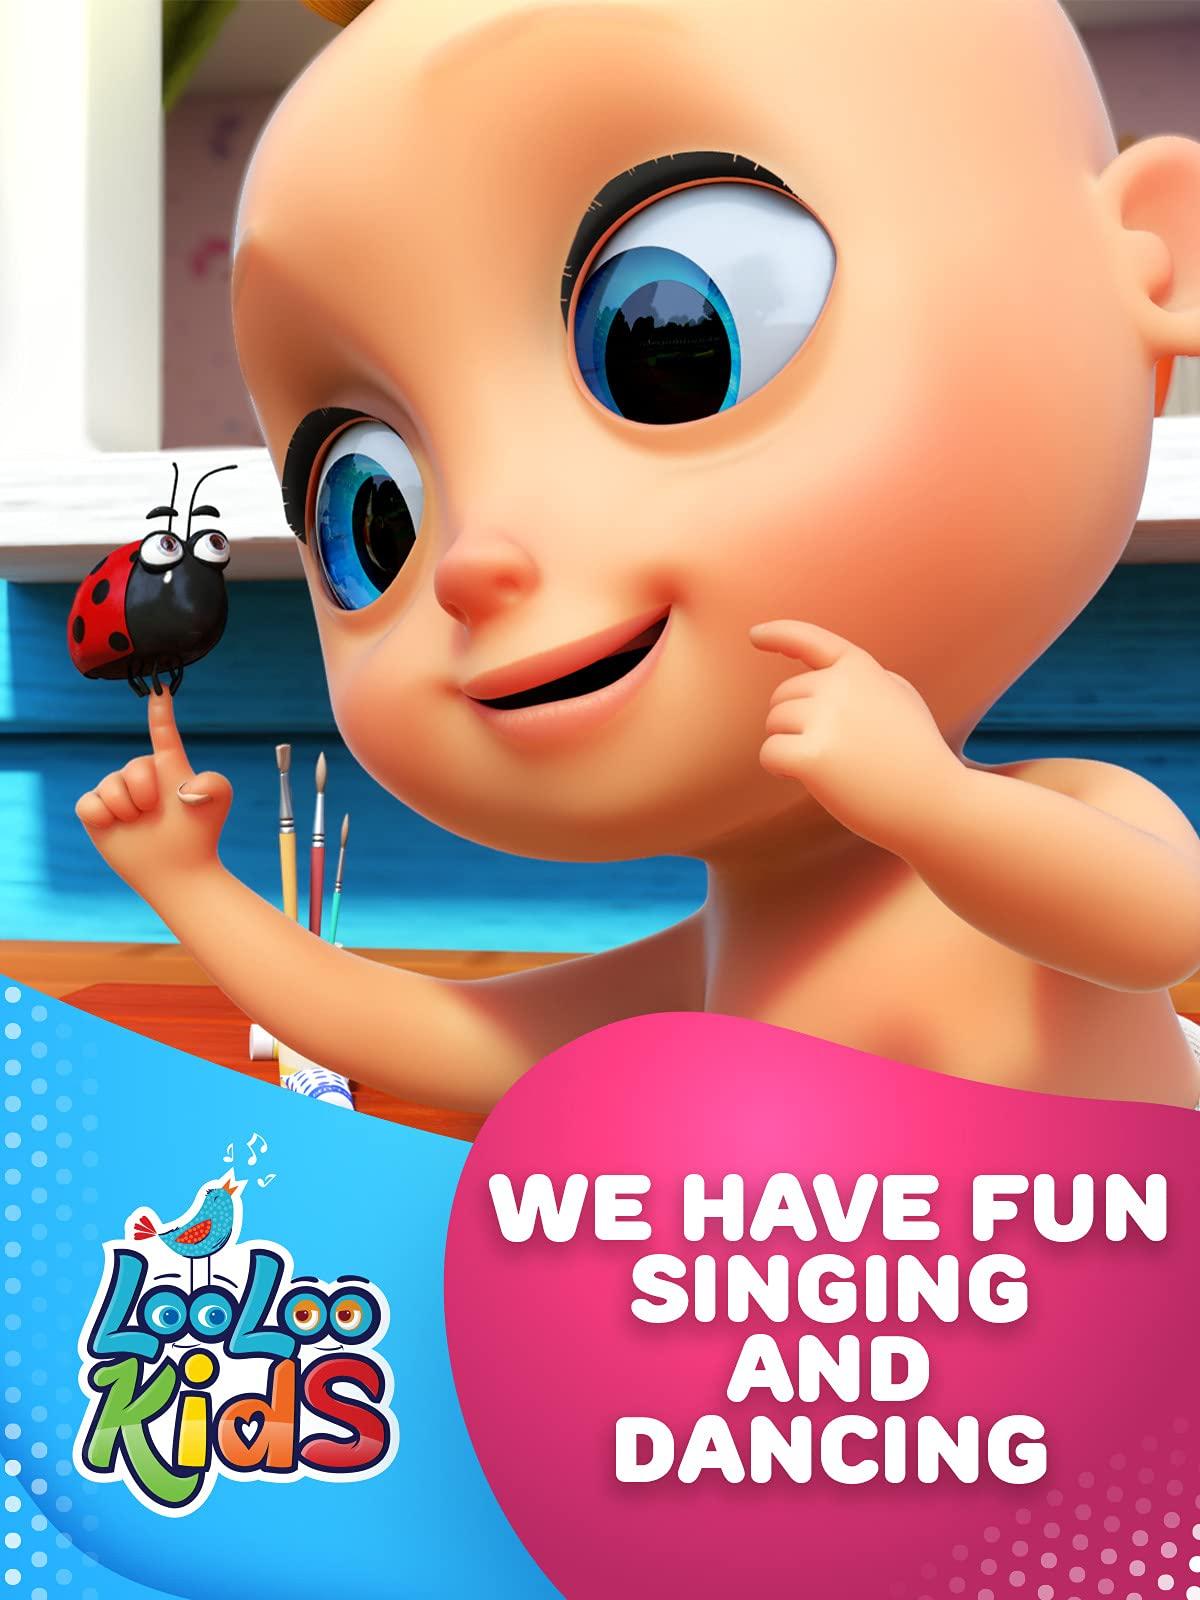 We Have Fun Singing and Dancing - LooLoo Kids